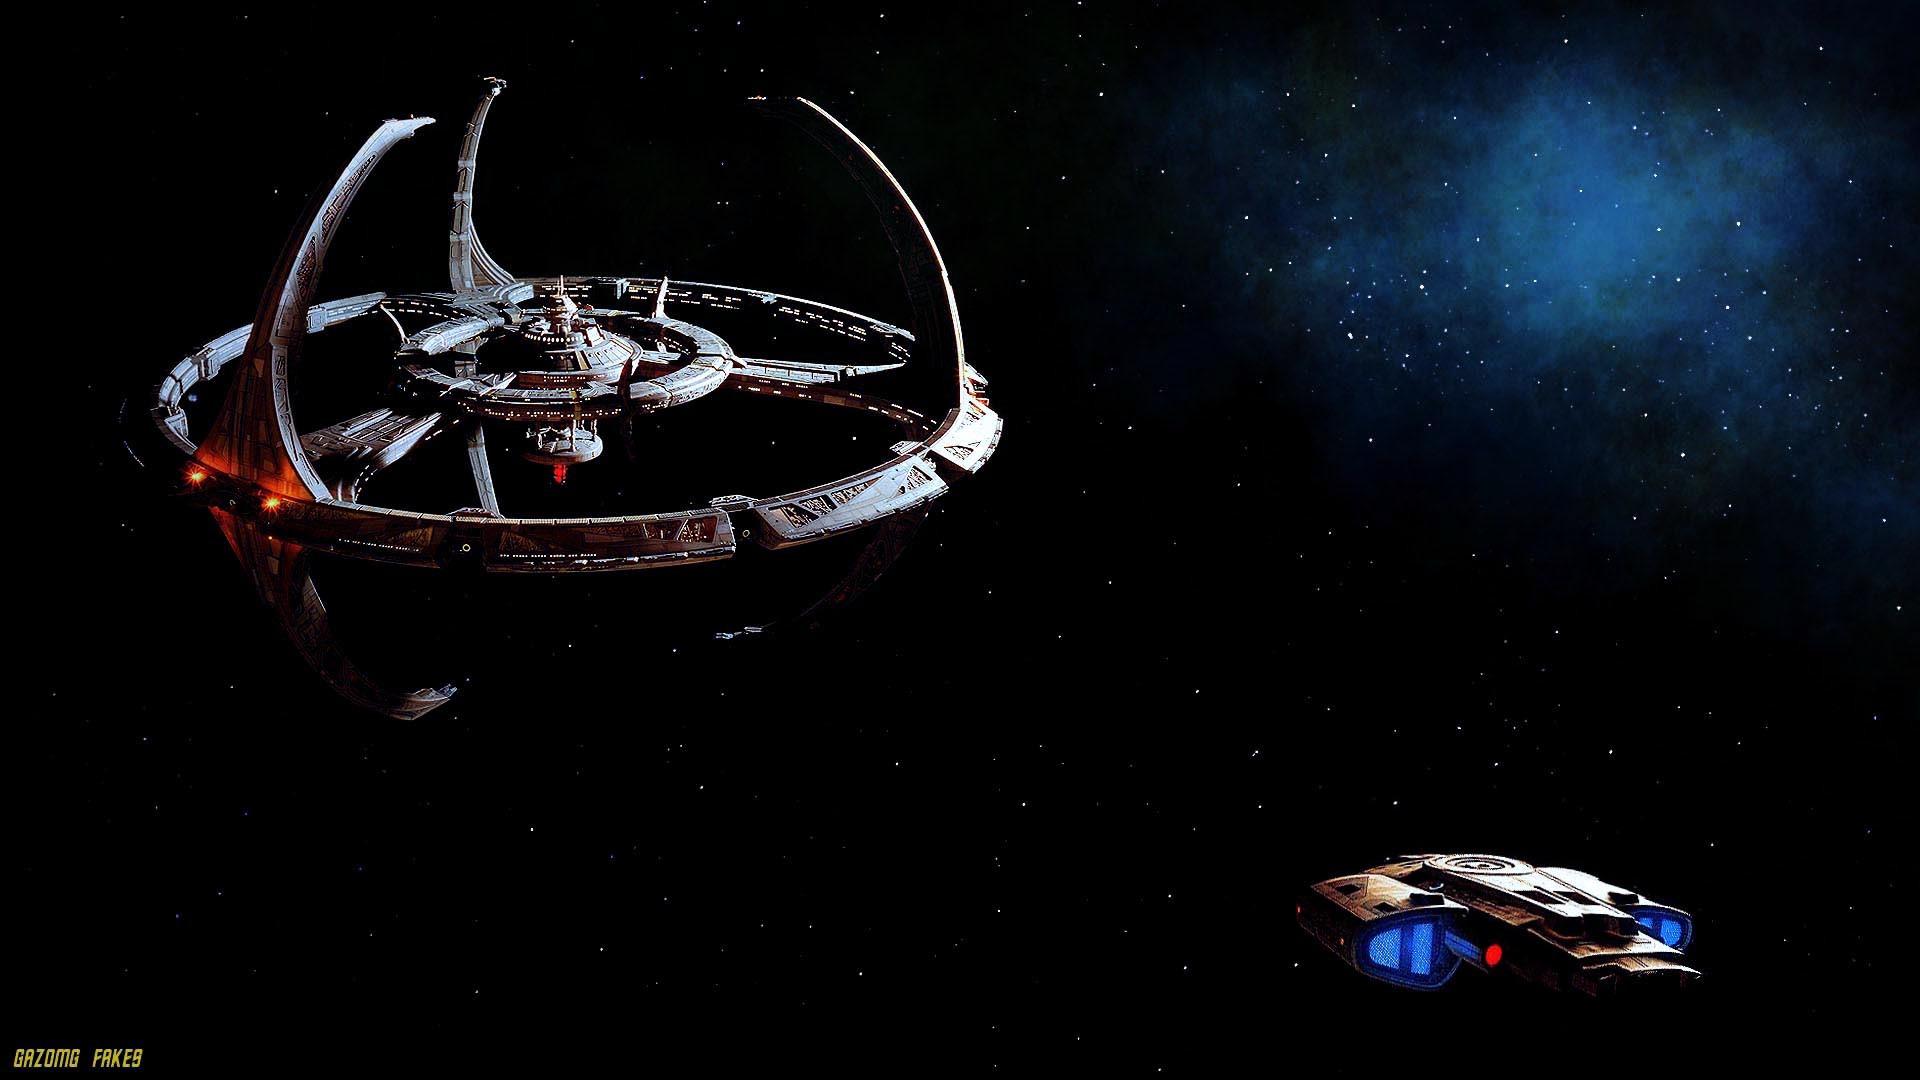 Star Trek: Deep Space Nine Wallpapers - Wallpaper Cave